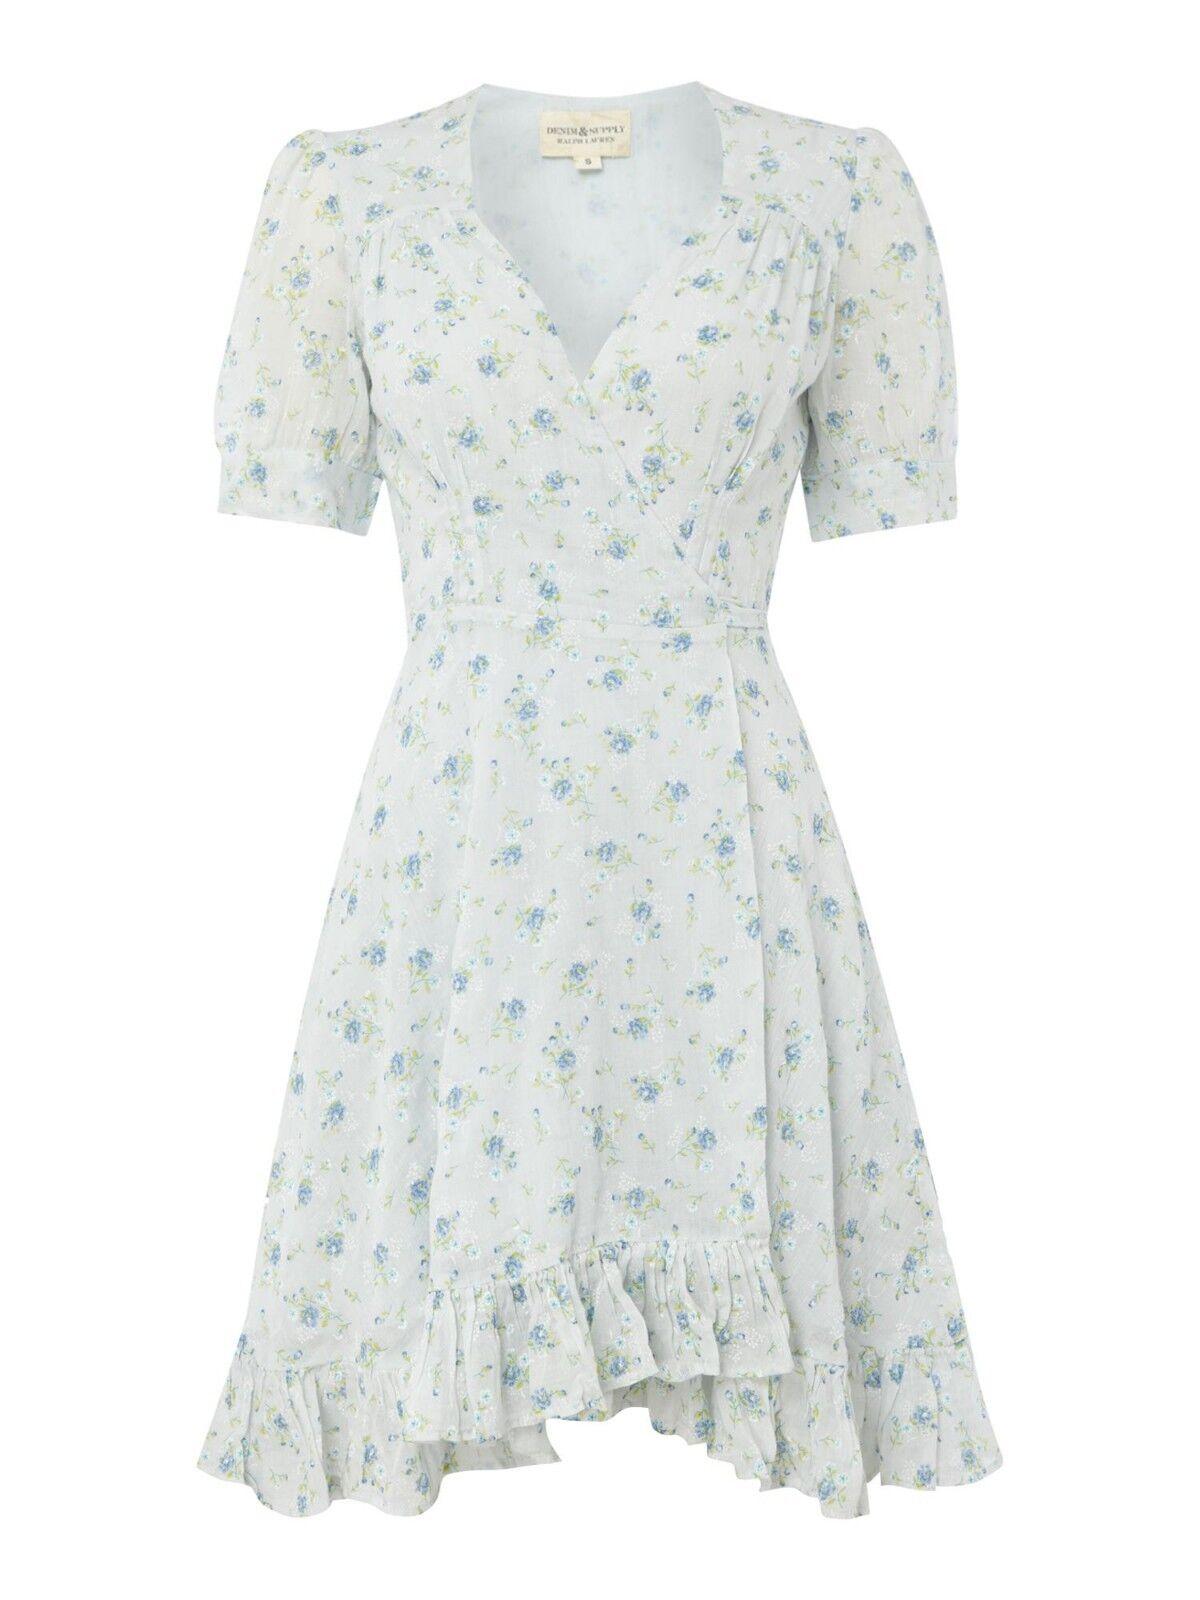 NEW Denim & Supply Ralph Lauren Floral    Wrap Dress Size XL 4f4001